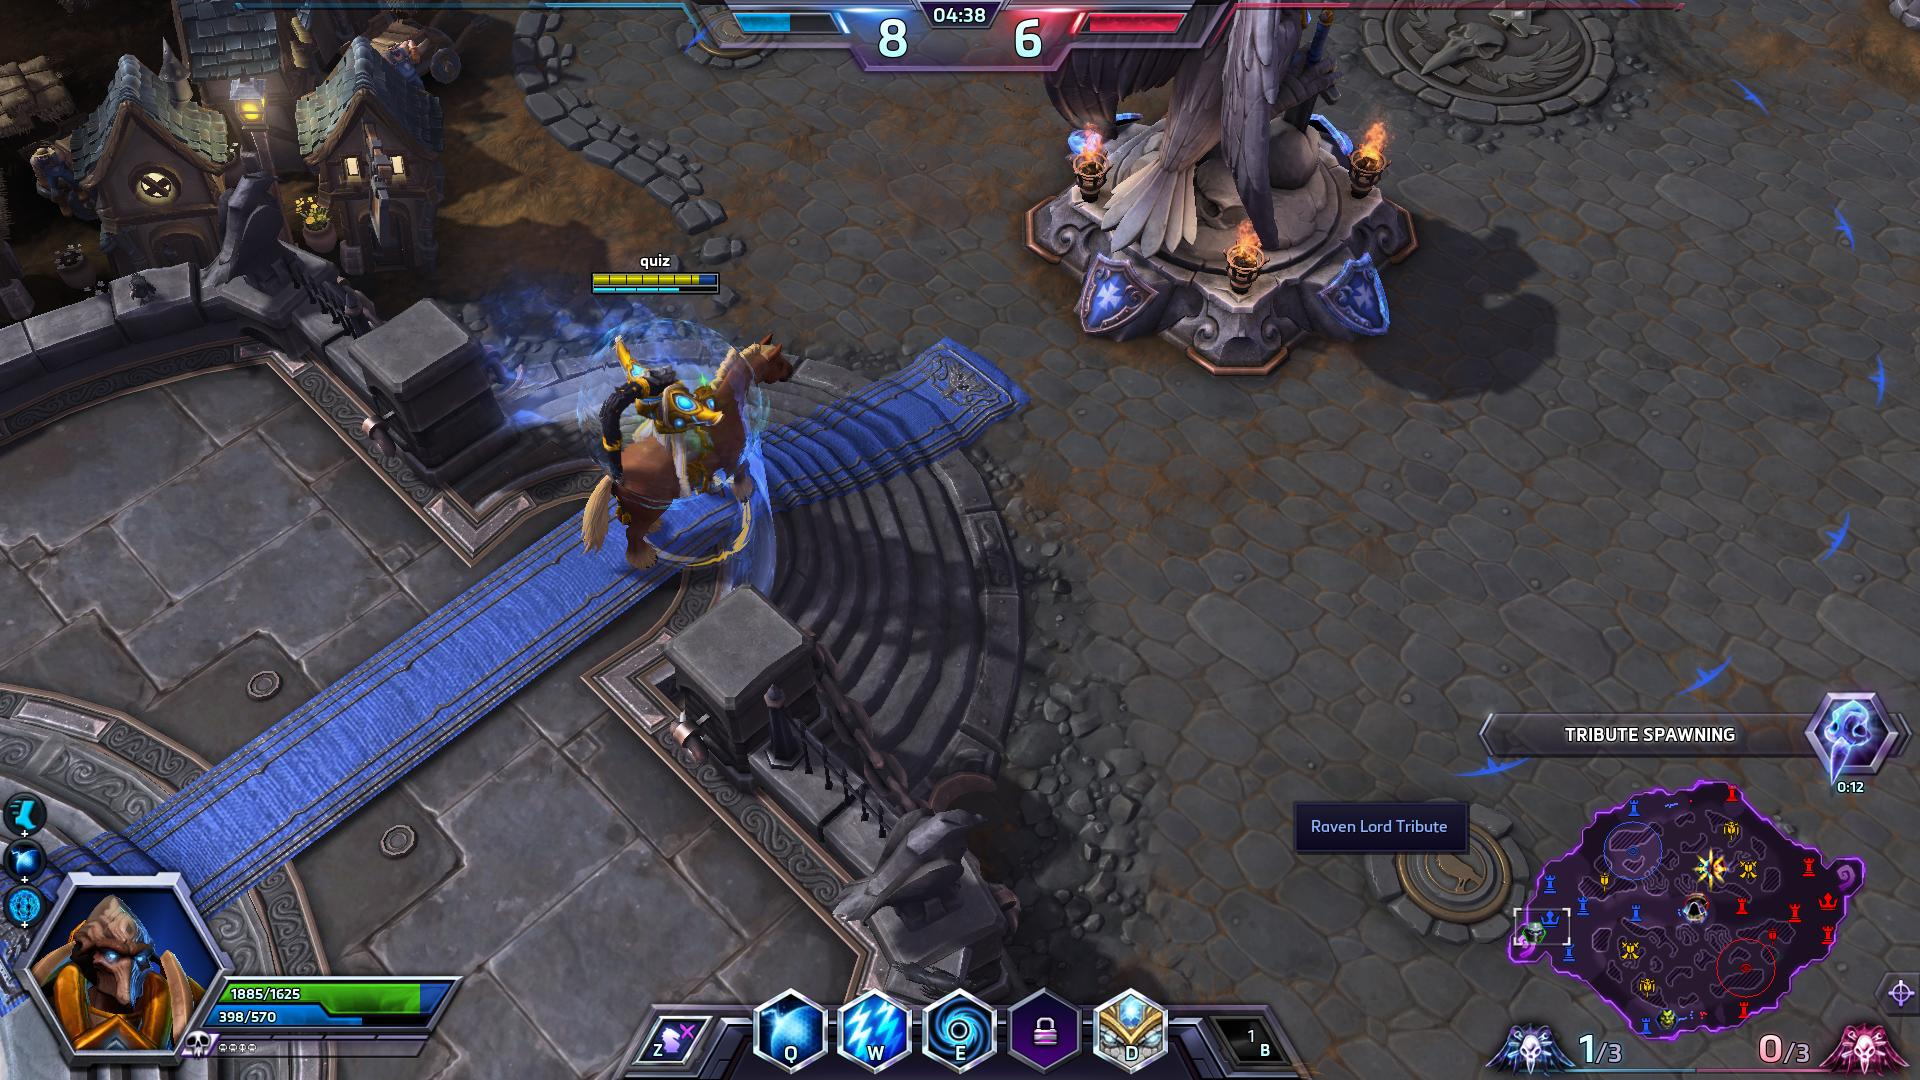 Tassadar HotS hots screenshot - Gamingcfg com